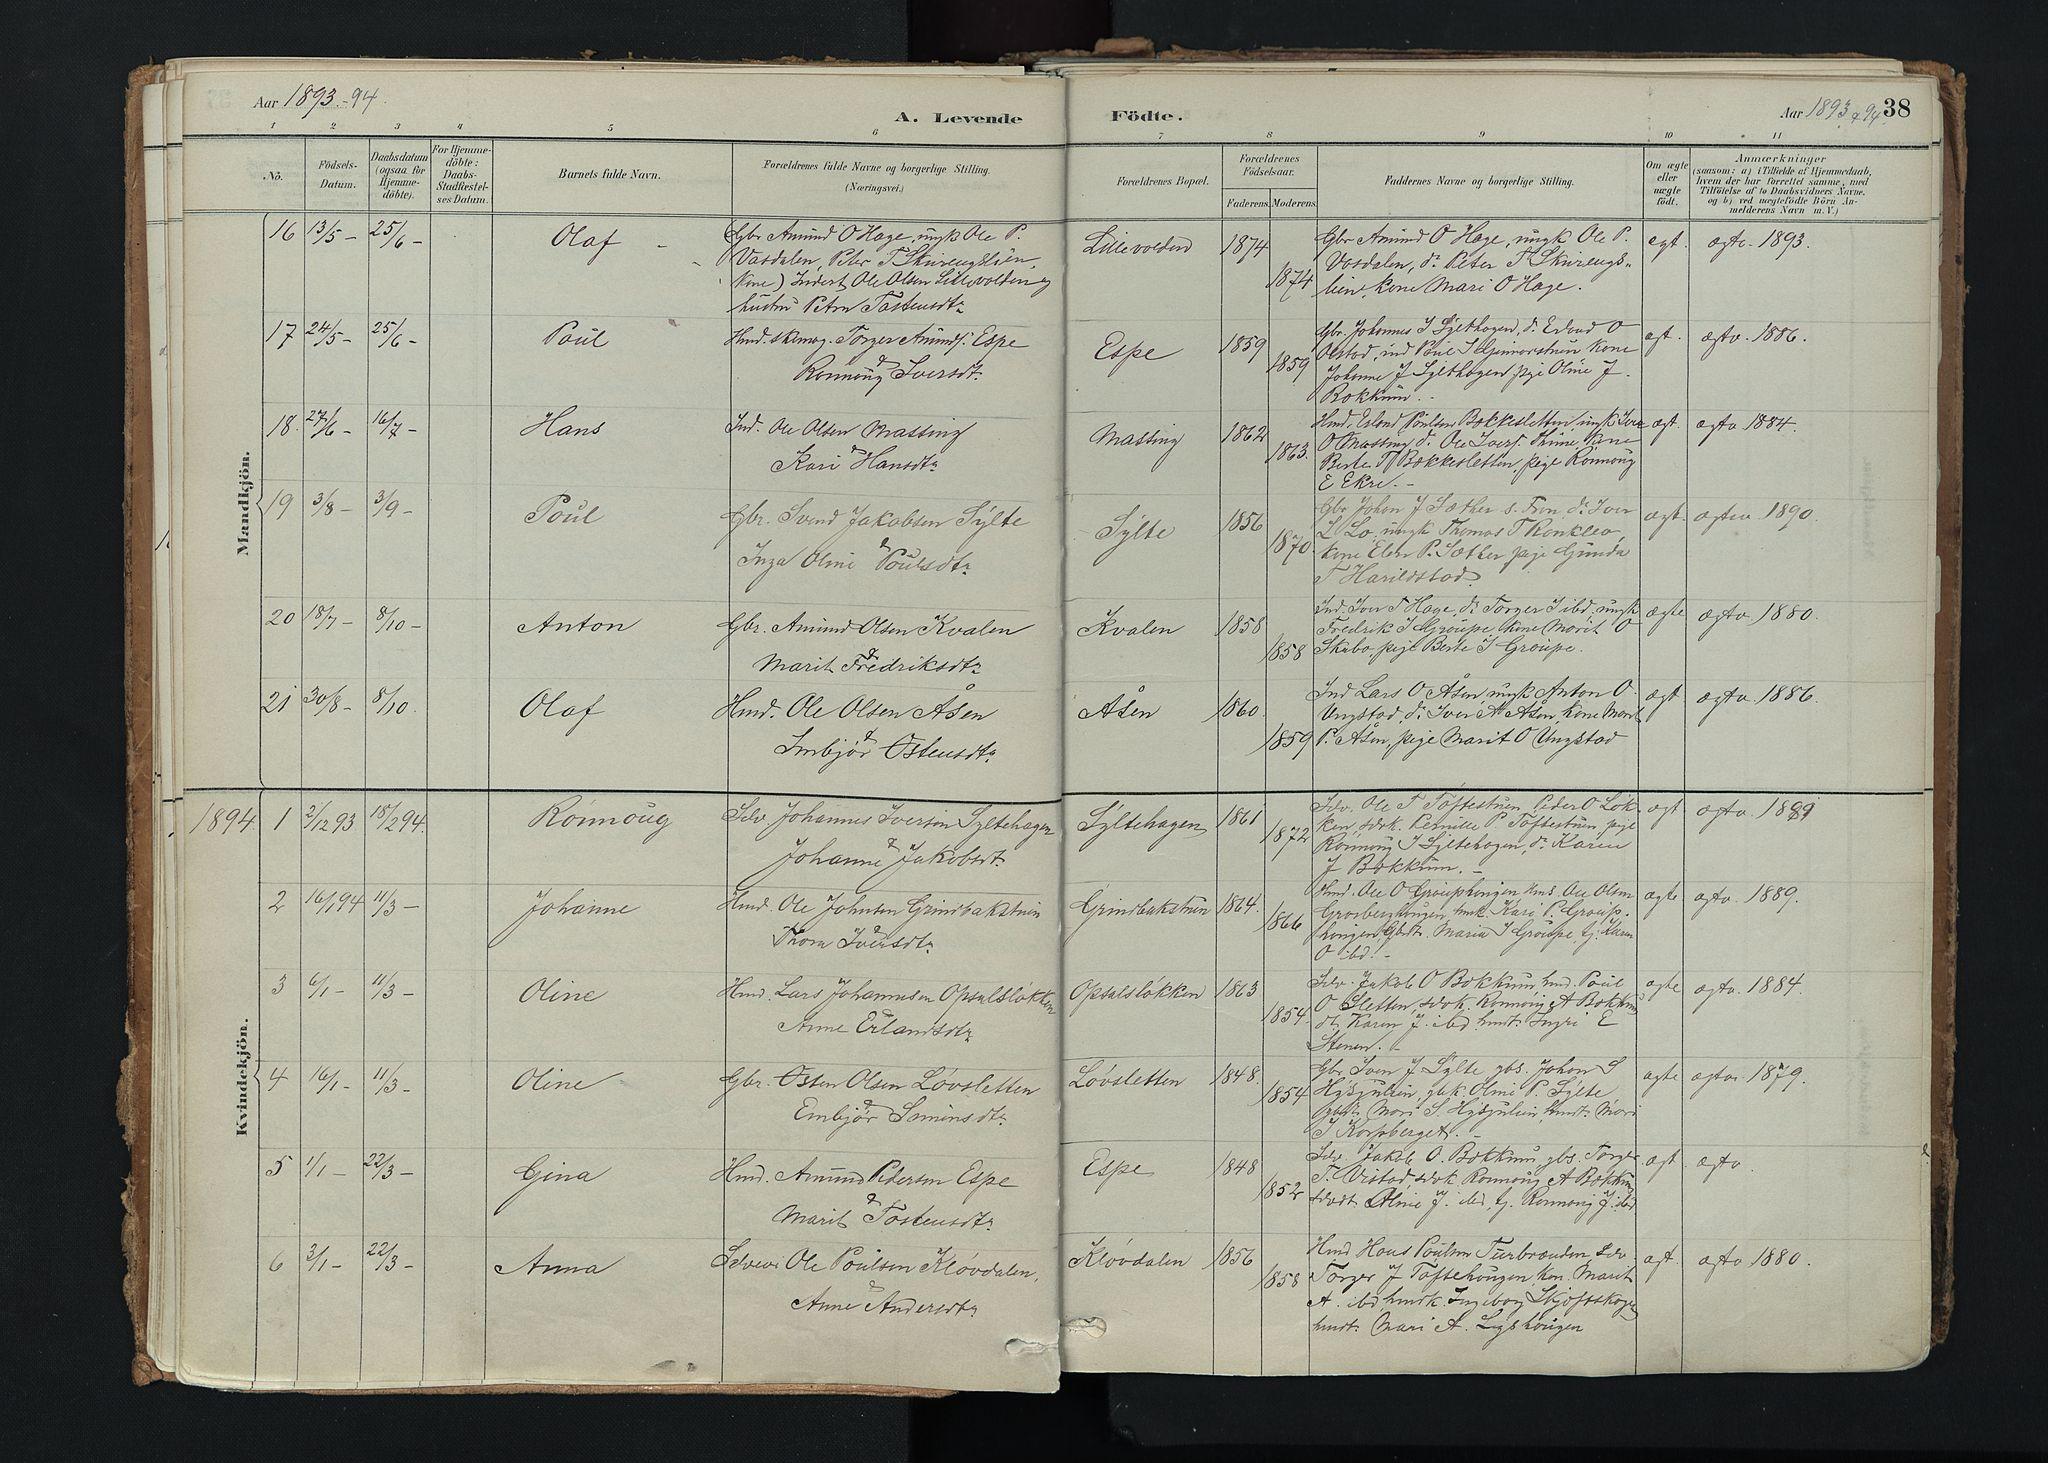 SAH, Nord-Fron prestekontor, Ministerialbok nr. 5, 1884-1914, s. 38